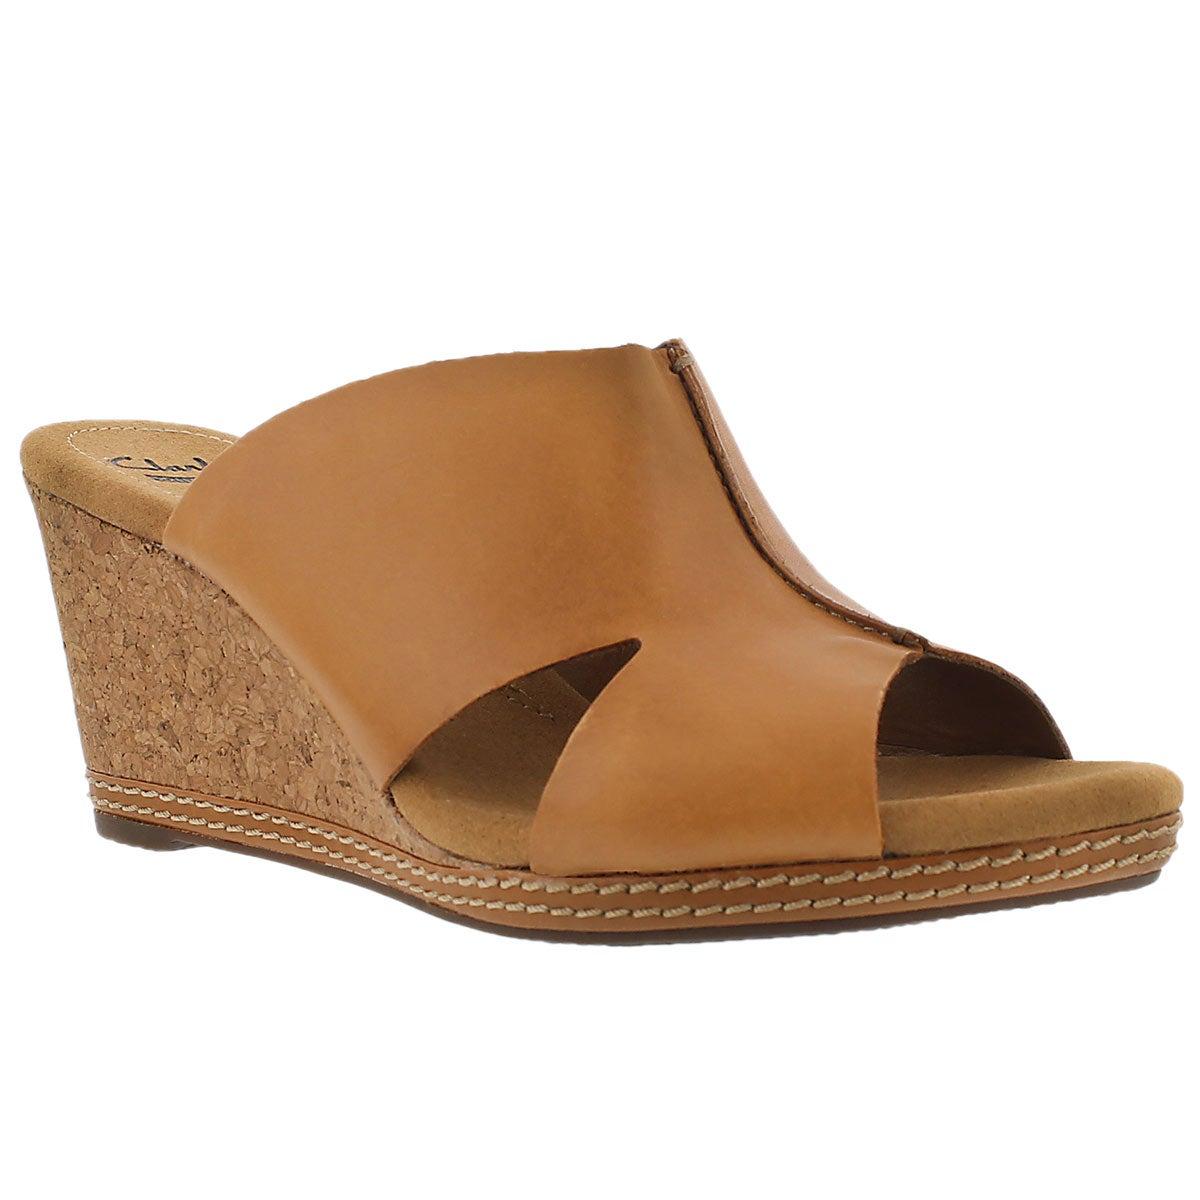 Women's HELIO ISLAND tan slide wedge sandals